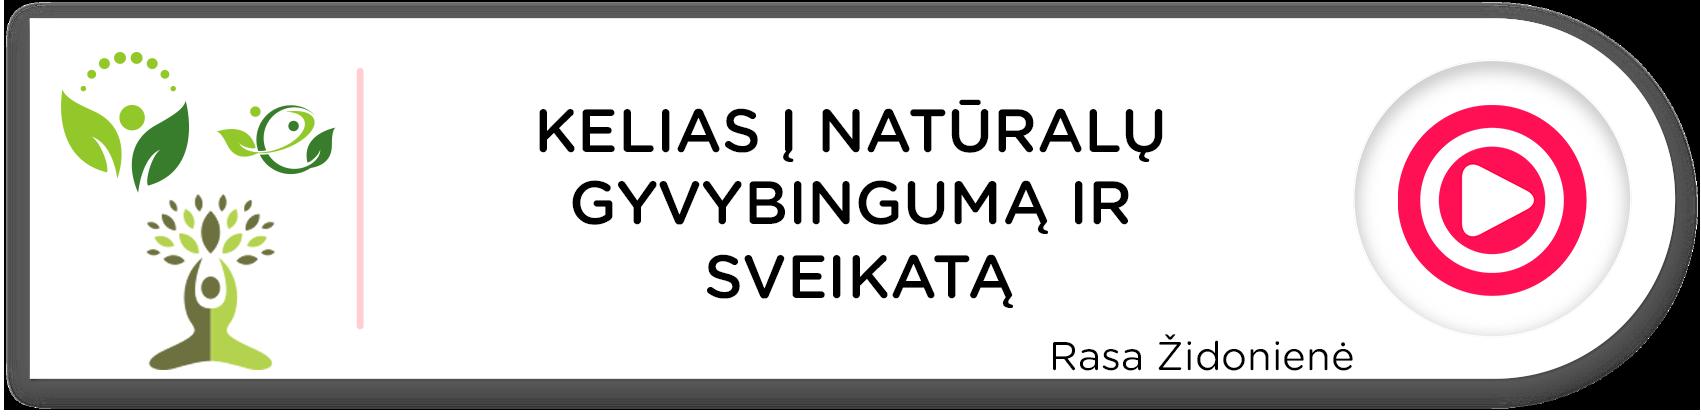 naturalus-gyvybingumas